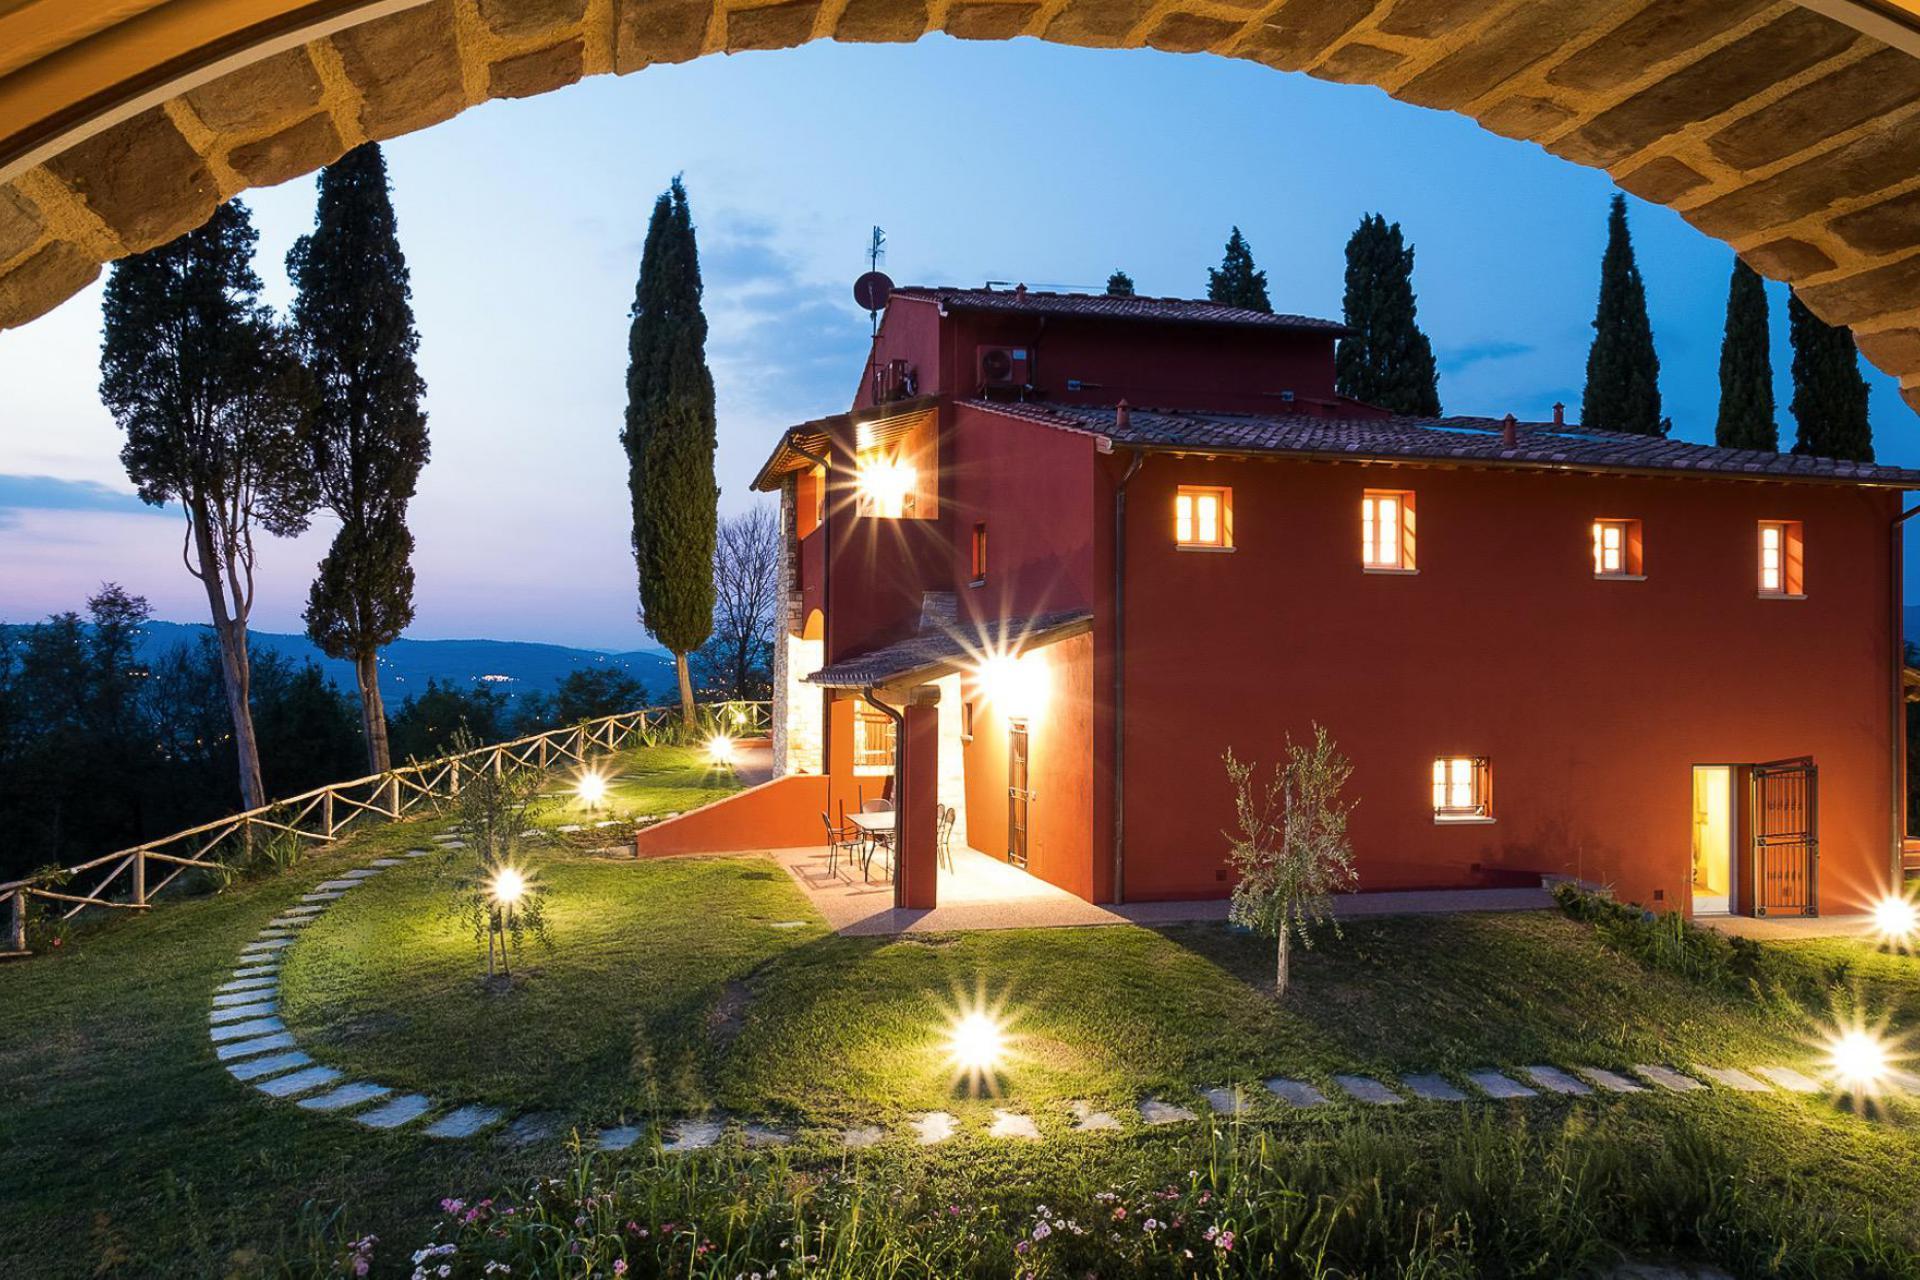 Agriturismo Toscana Agriturismo in Toscana con interni design